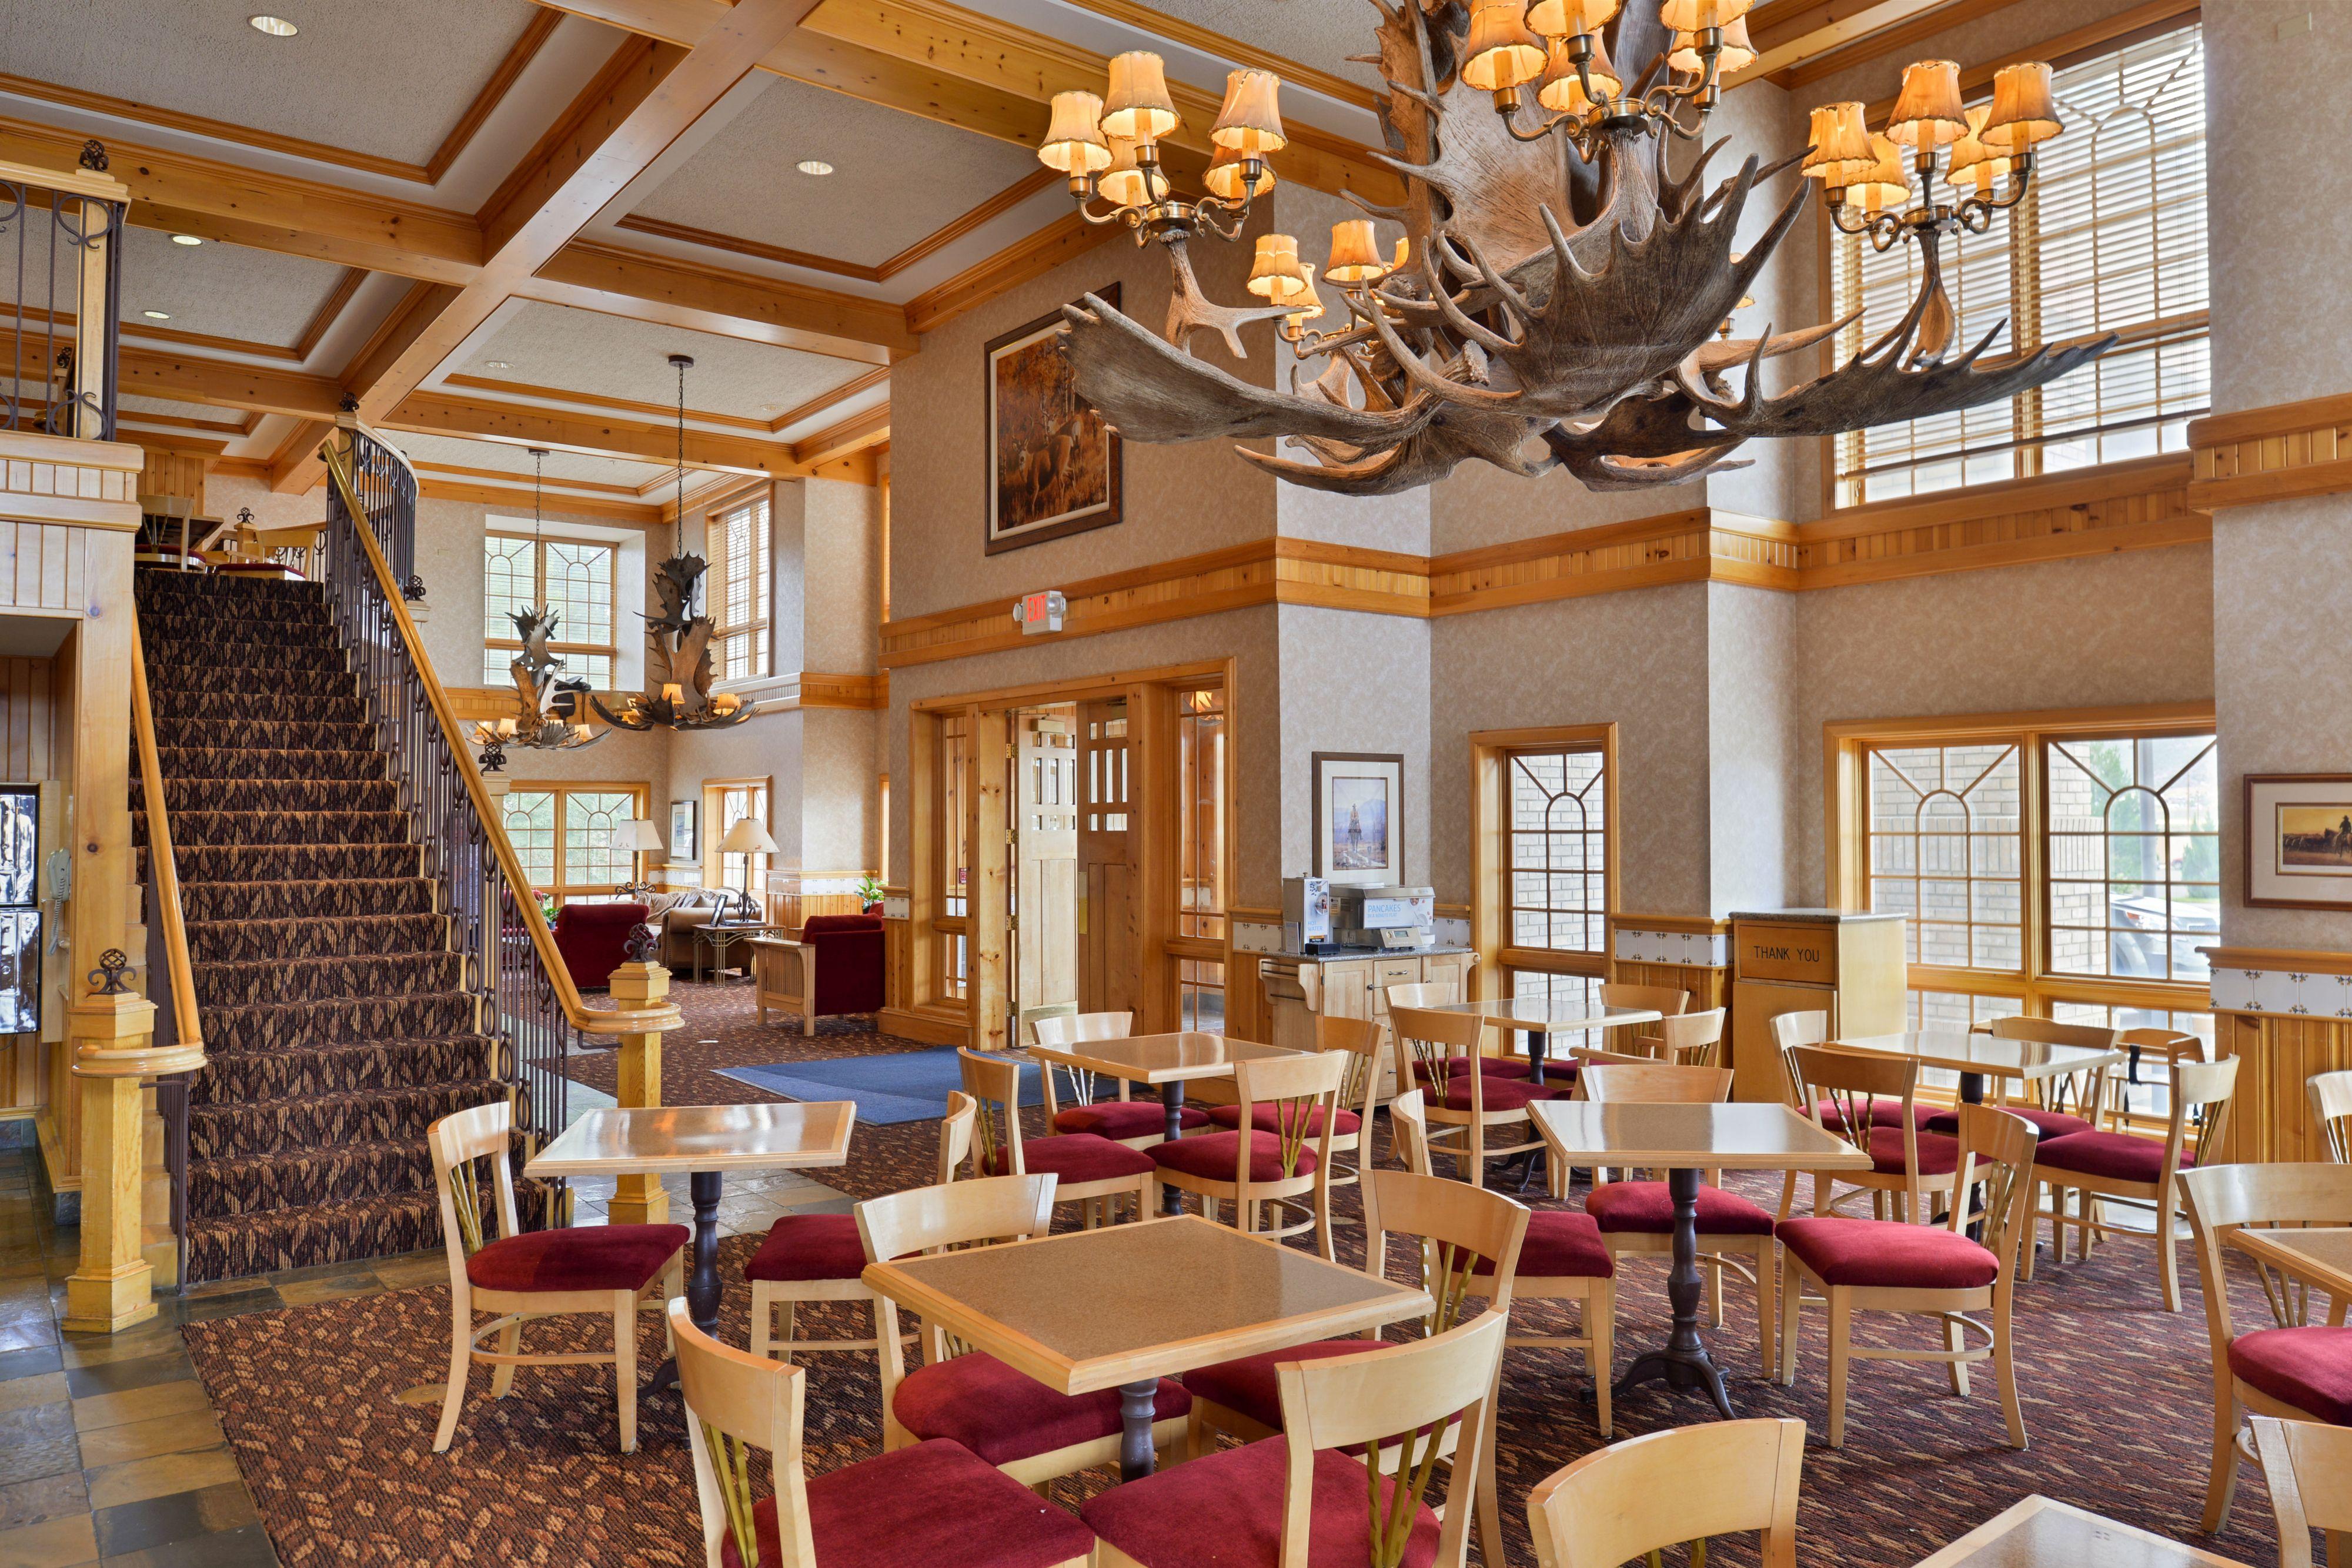 Holiday Inn Express & Suites Elko image 4